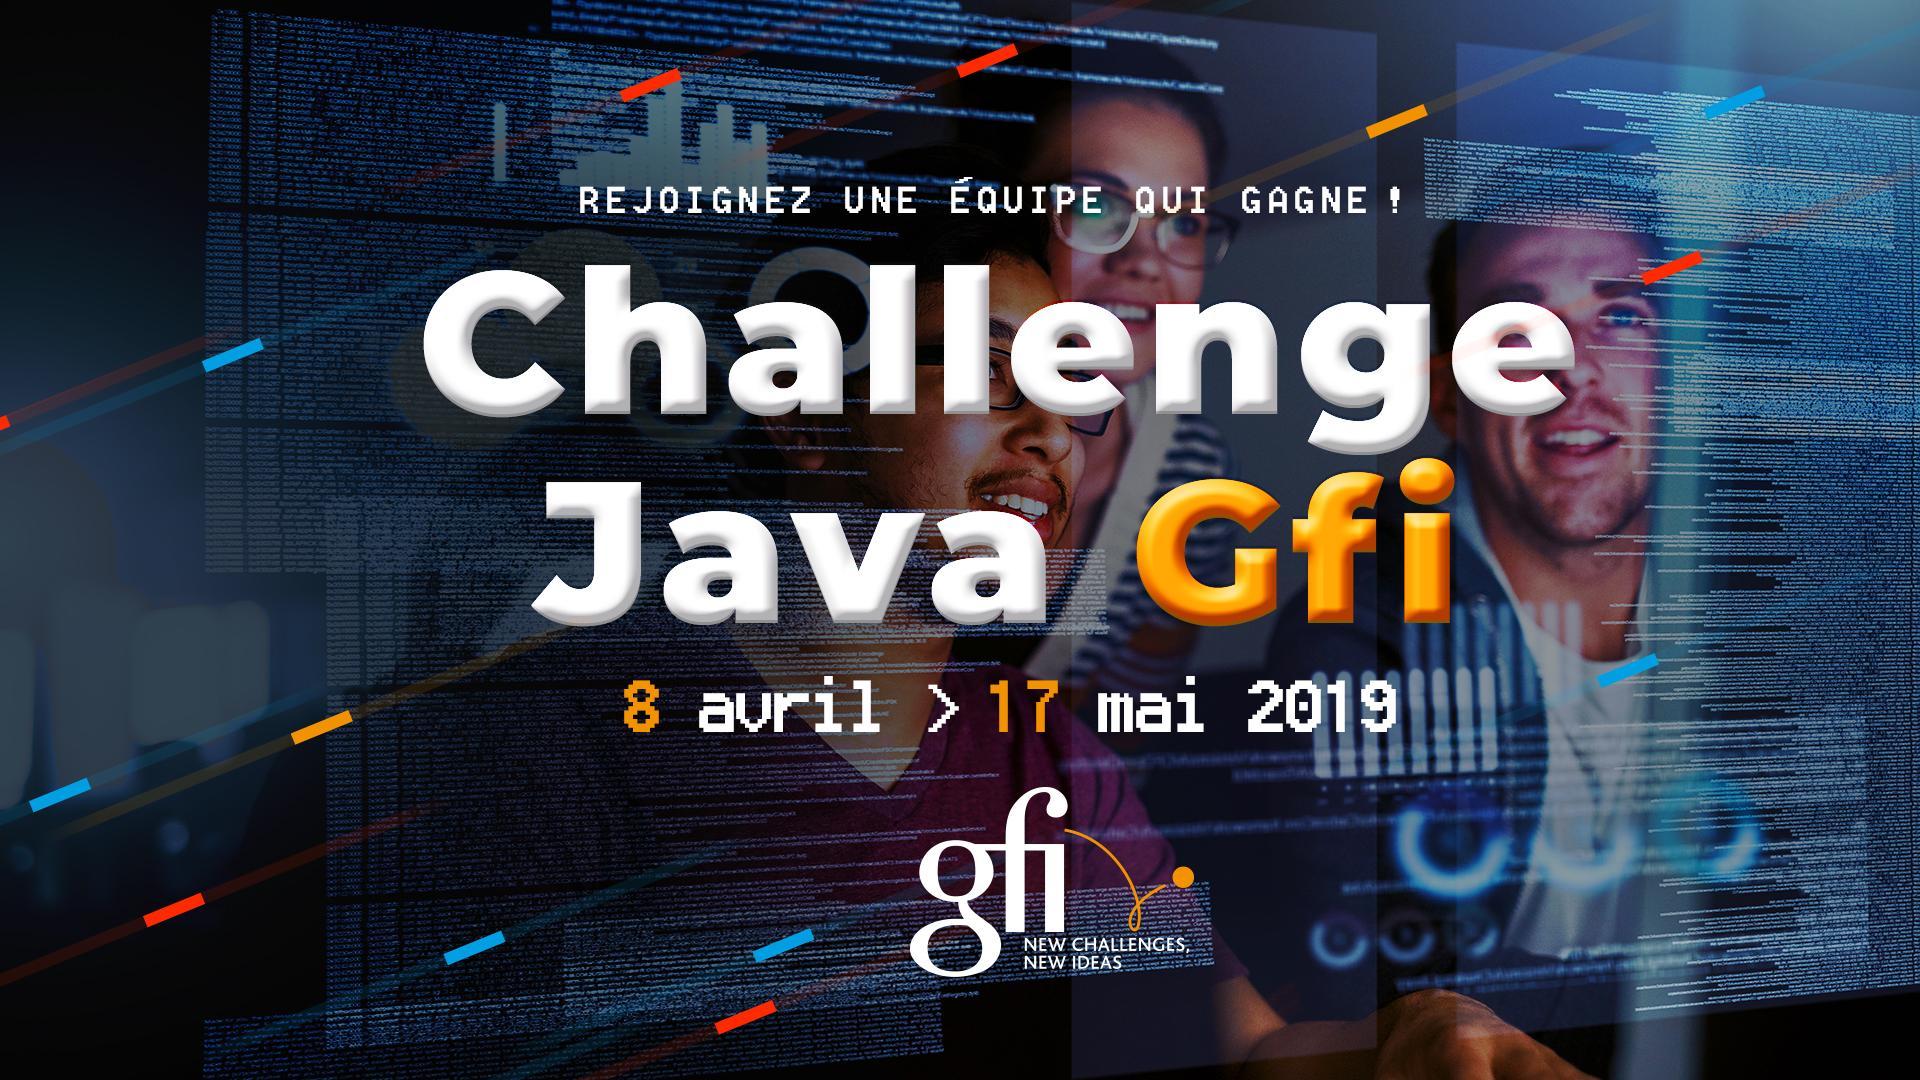 Java Challenge France 2019 GFI